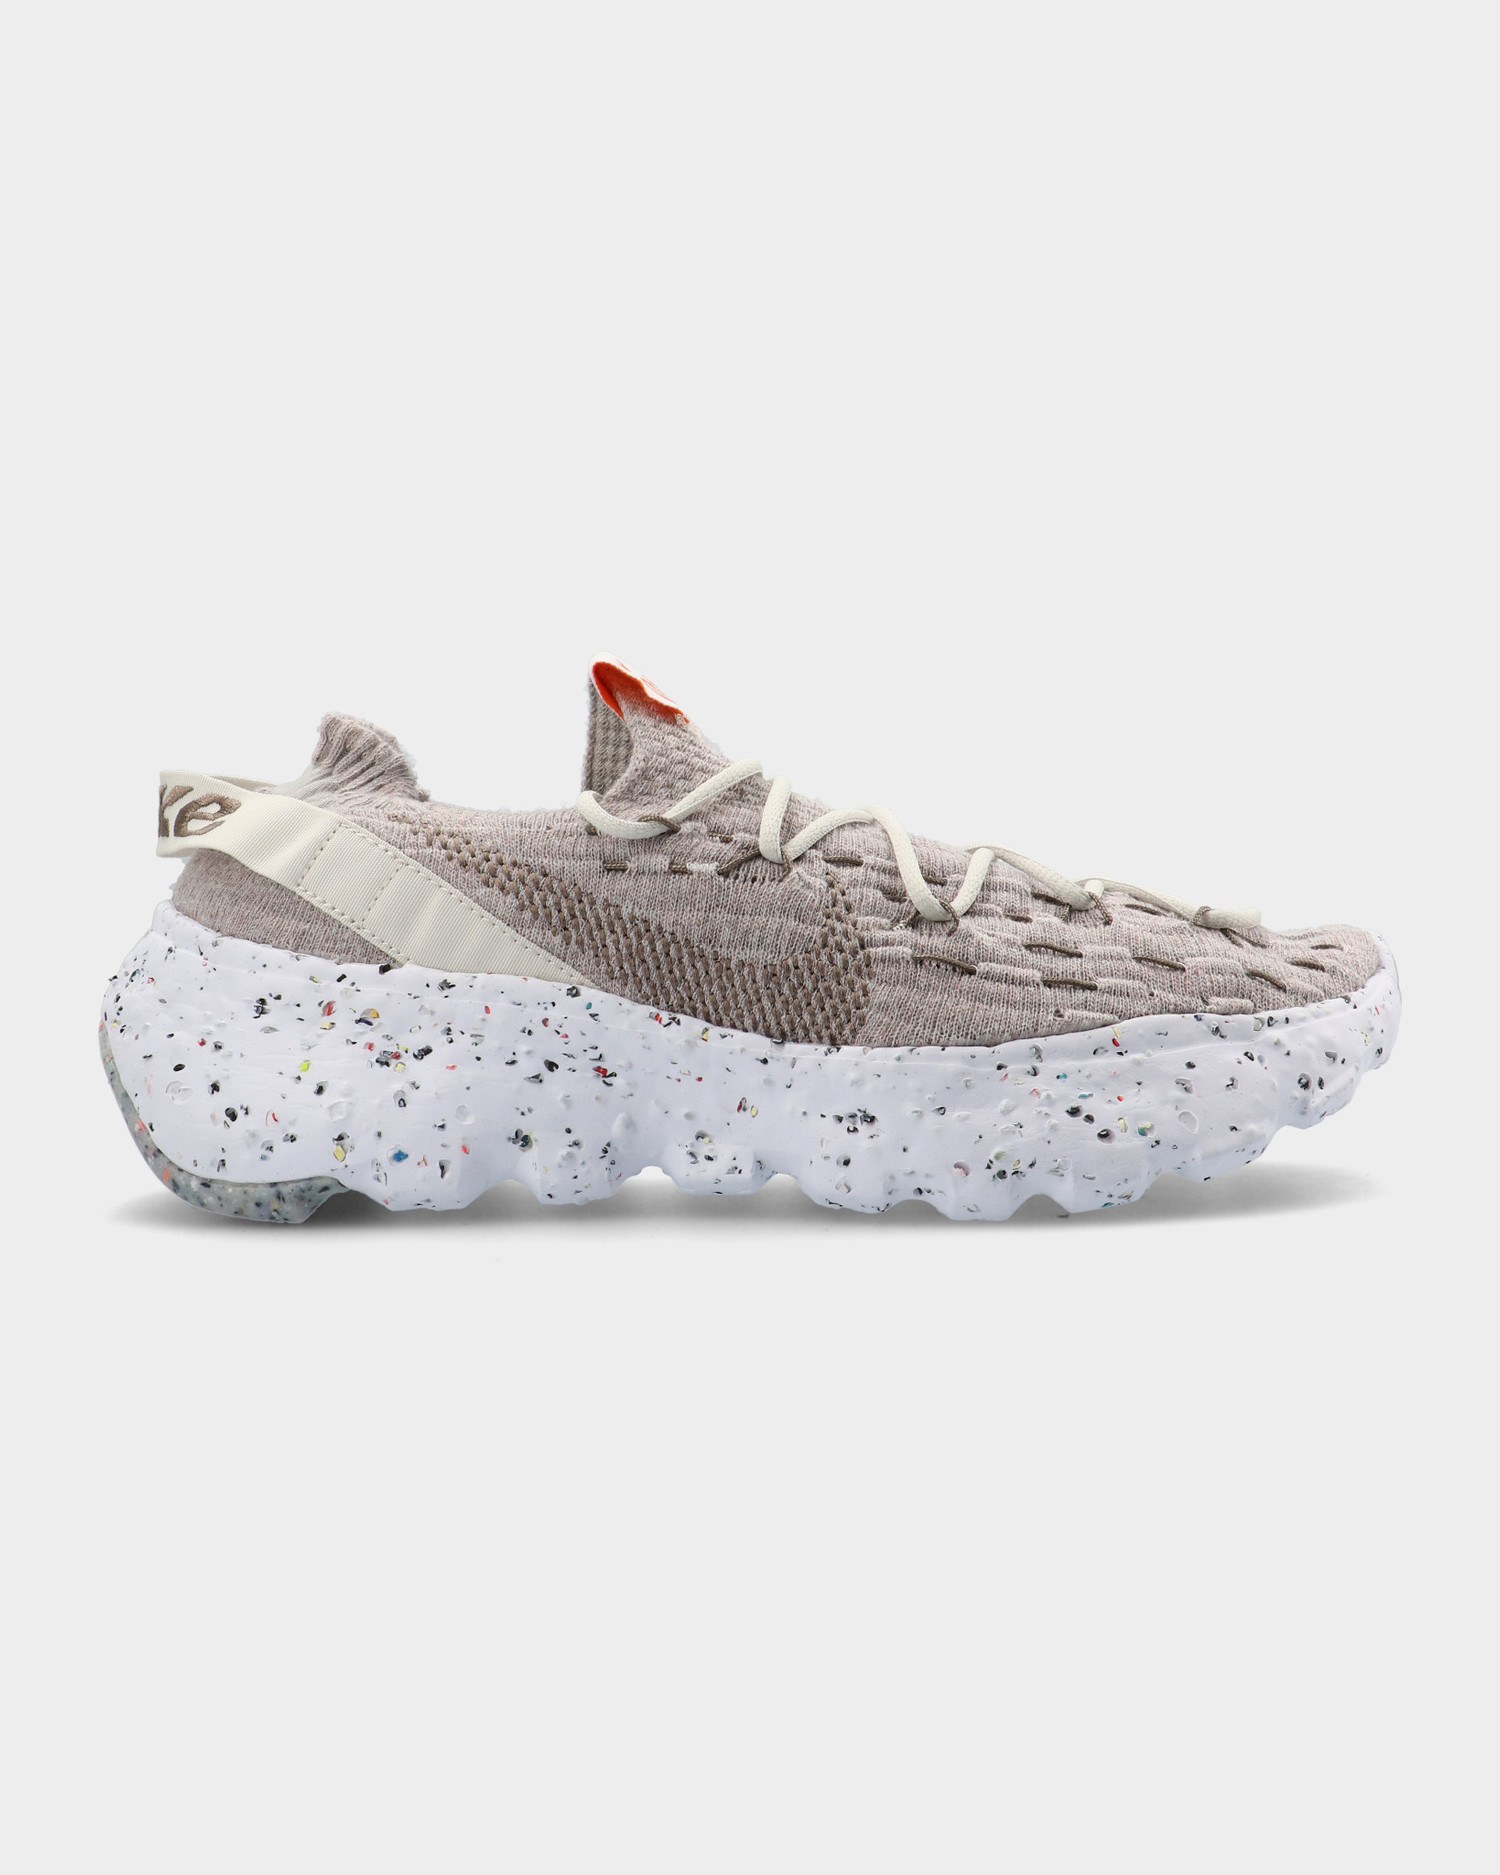 Nike Space Hippie 04 Light Bone/Olive Grey-White-Orange